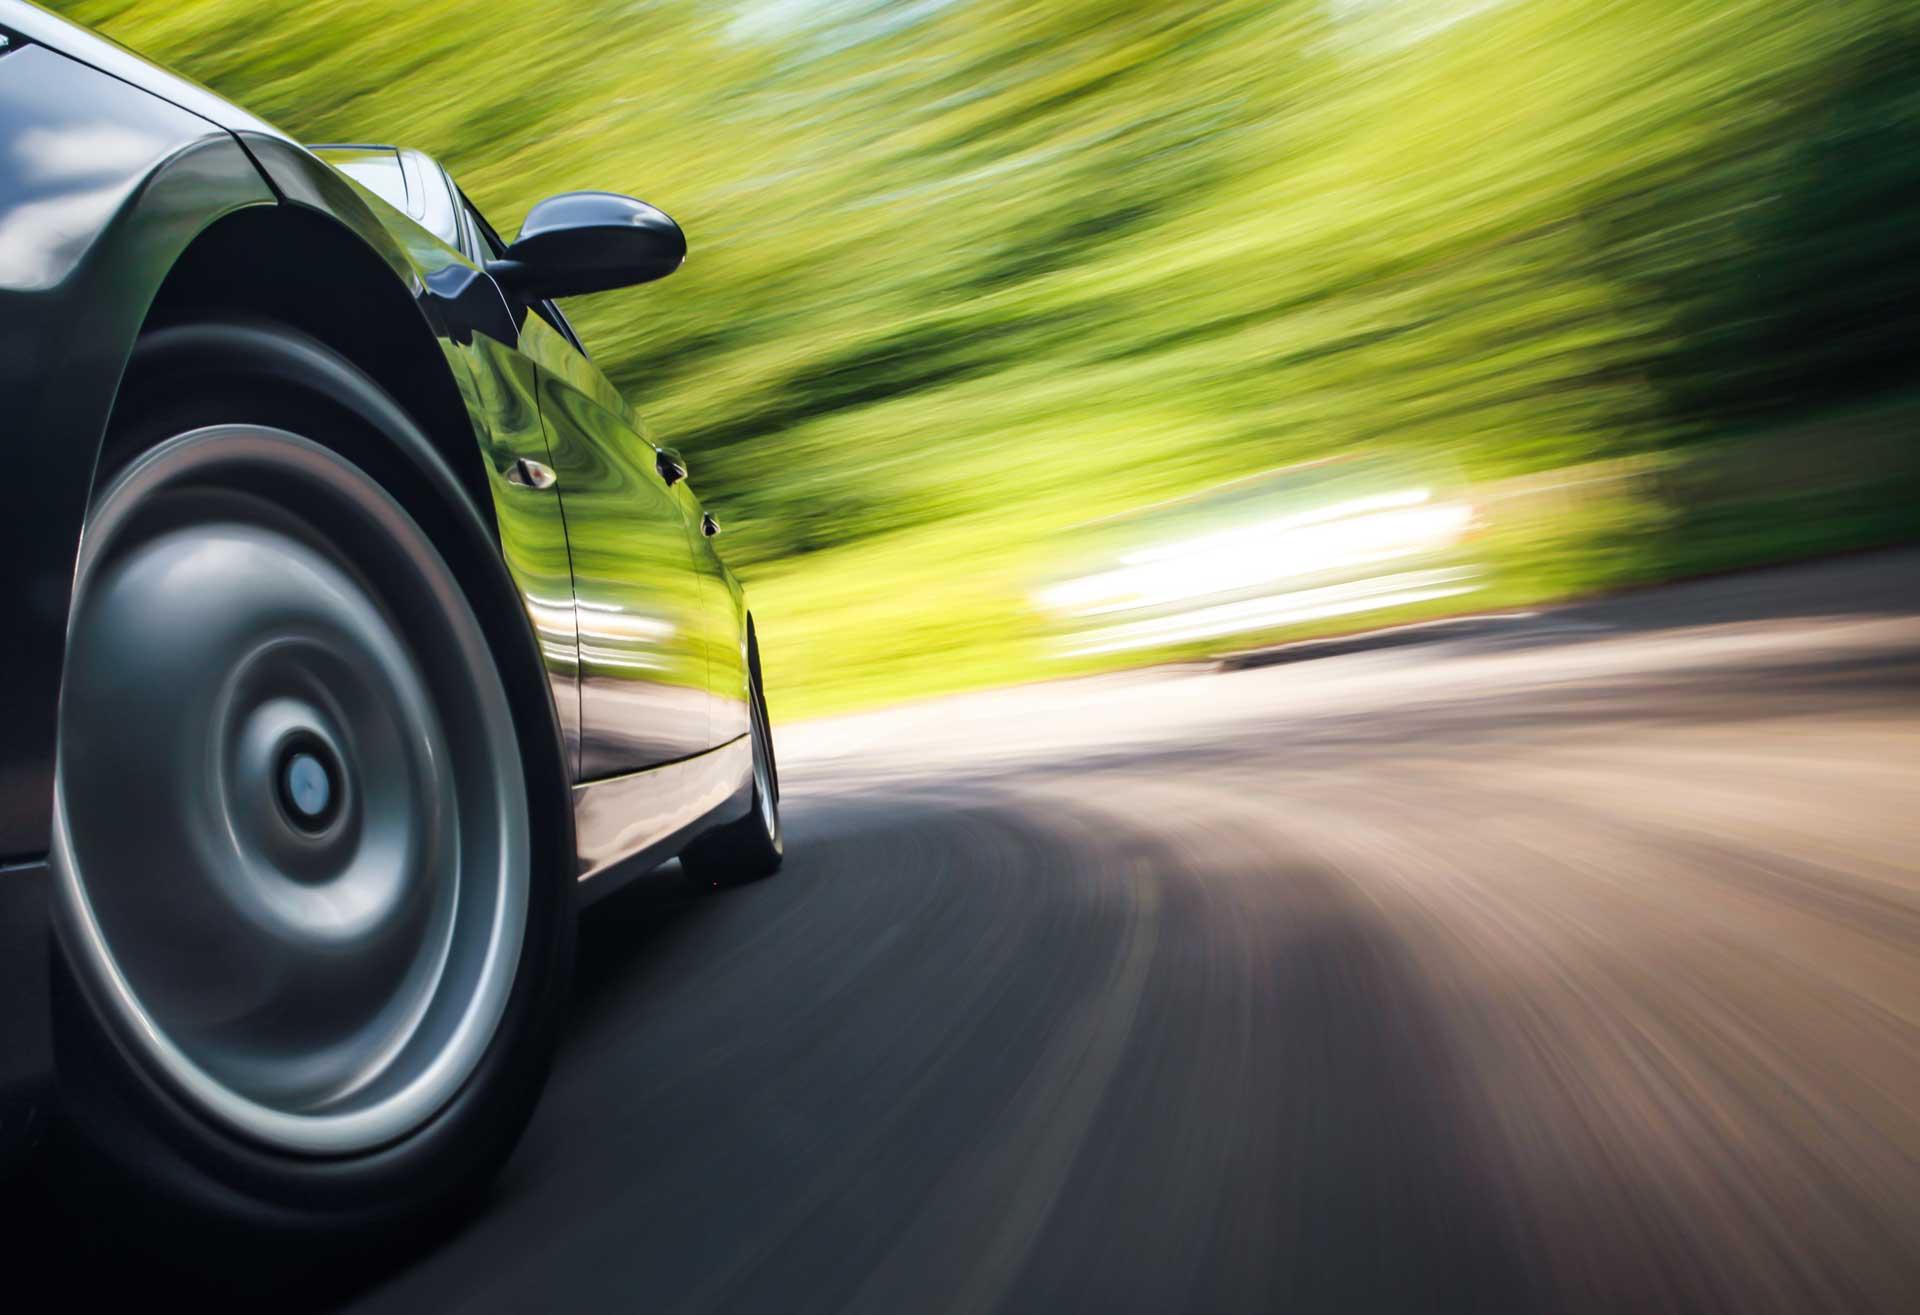 car-driving-fast